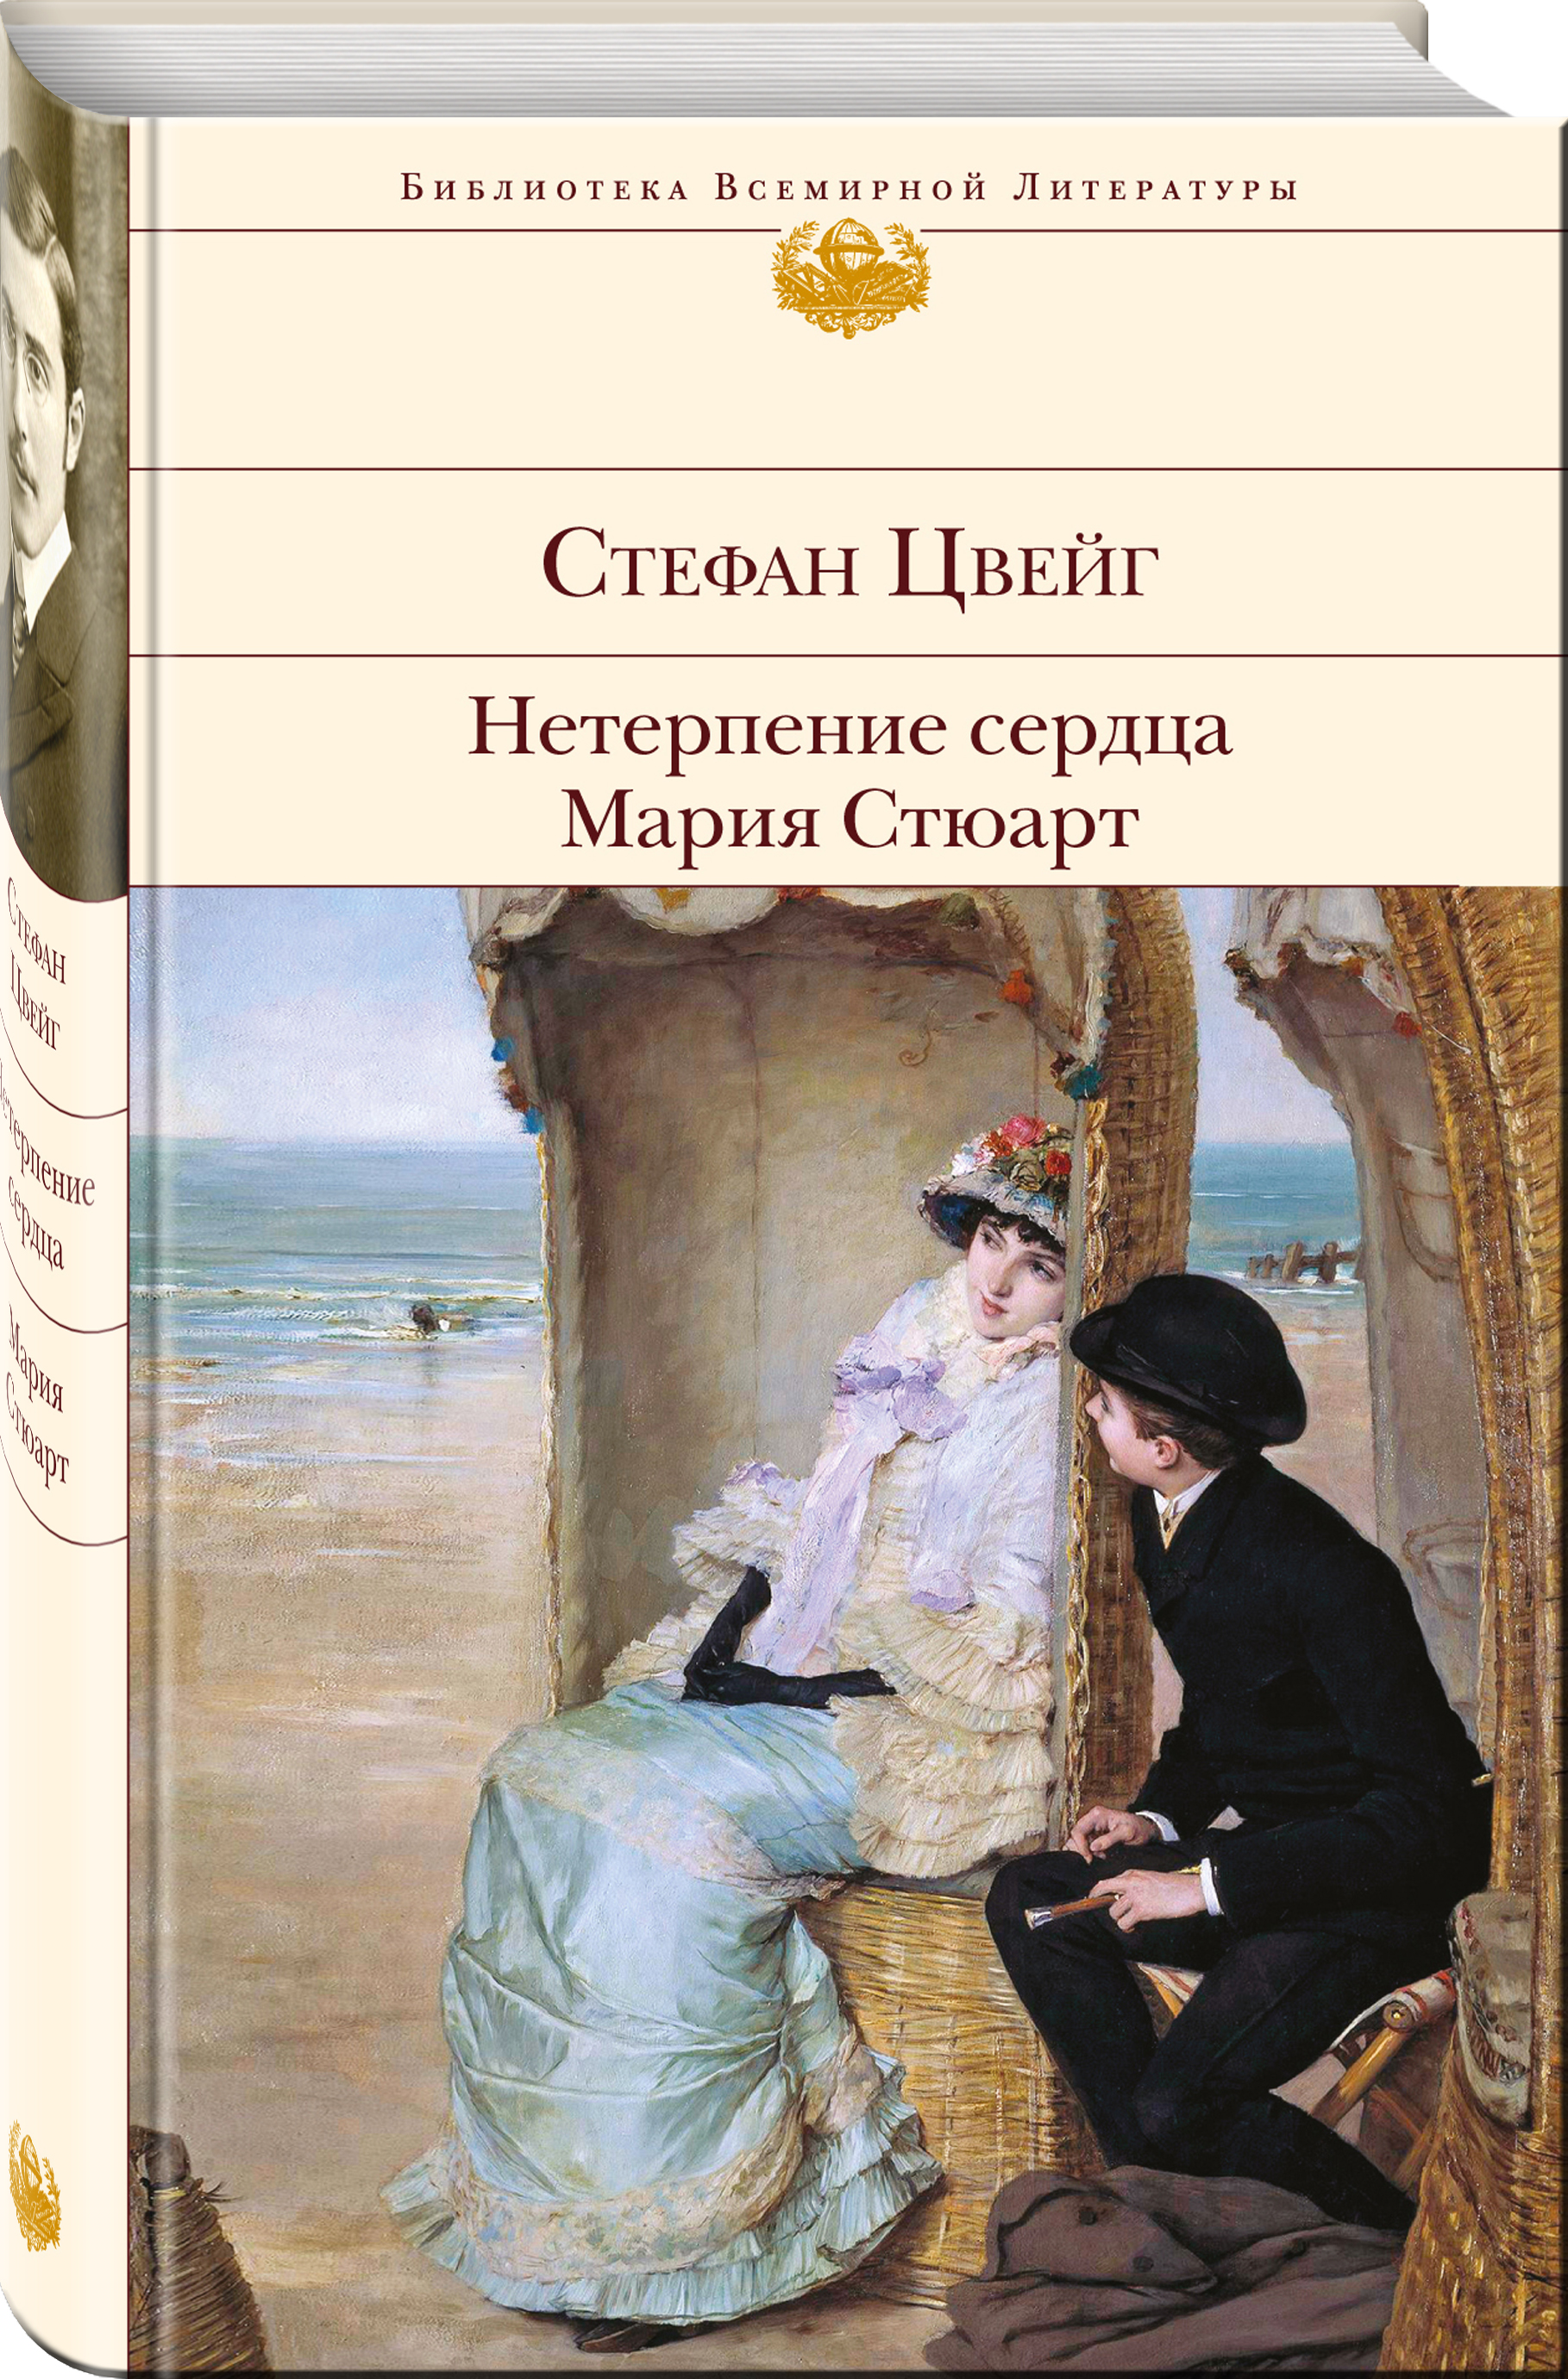 Стефан Цвейг Нетерпение сердца. Мария Стюарт